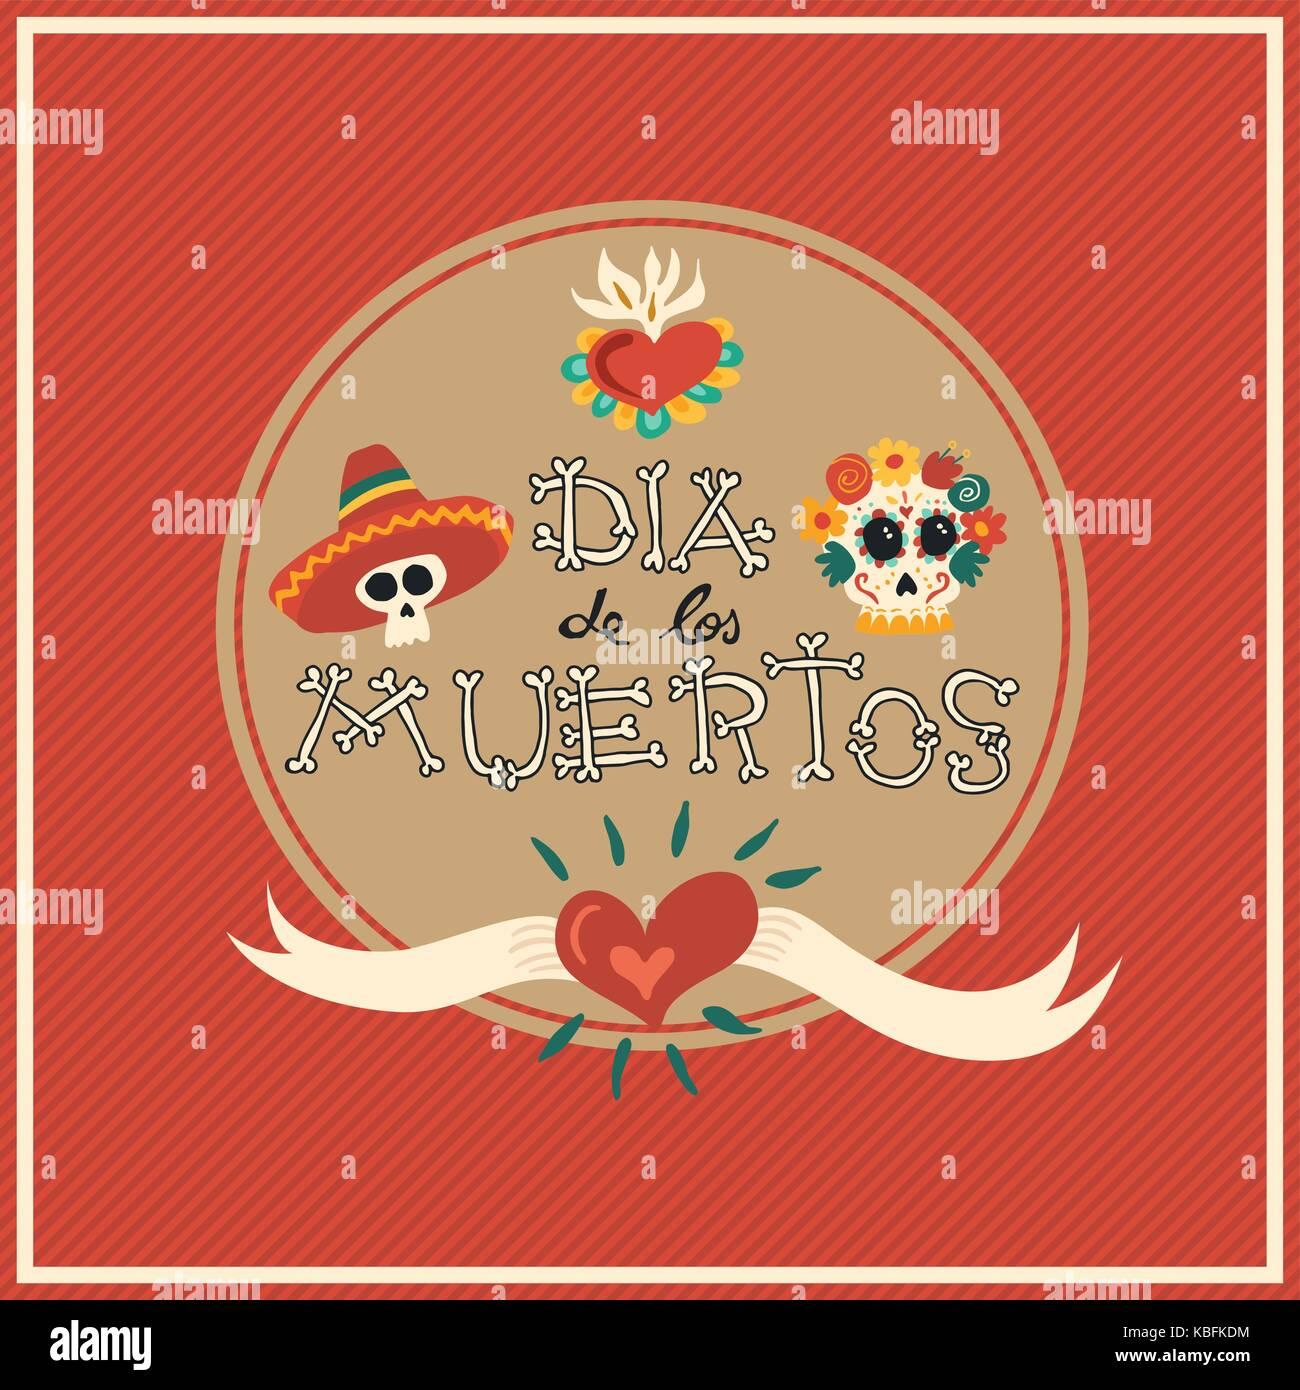 Día de Muertos calaveras de azúcar mariachi ilustración para la celebración  mexicana 82fd43e5865